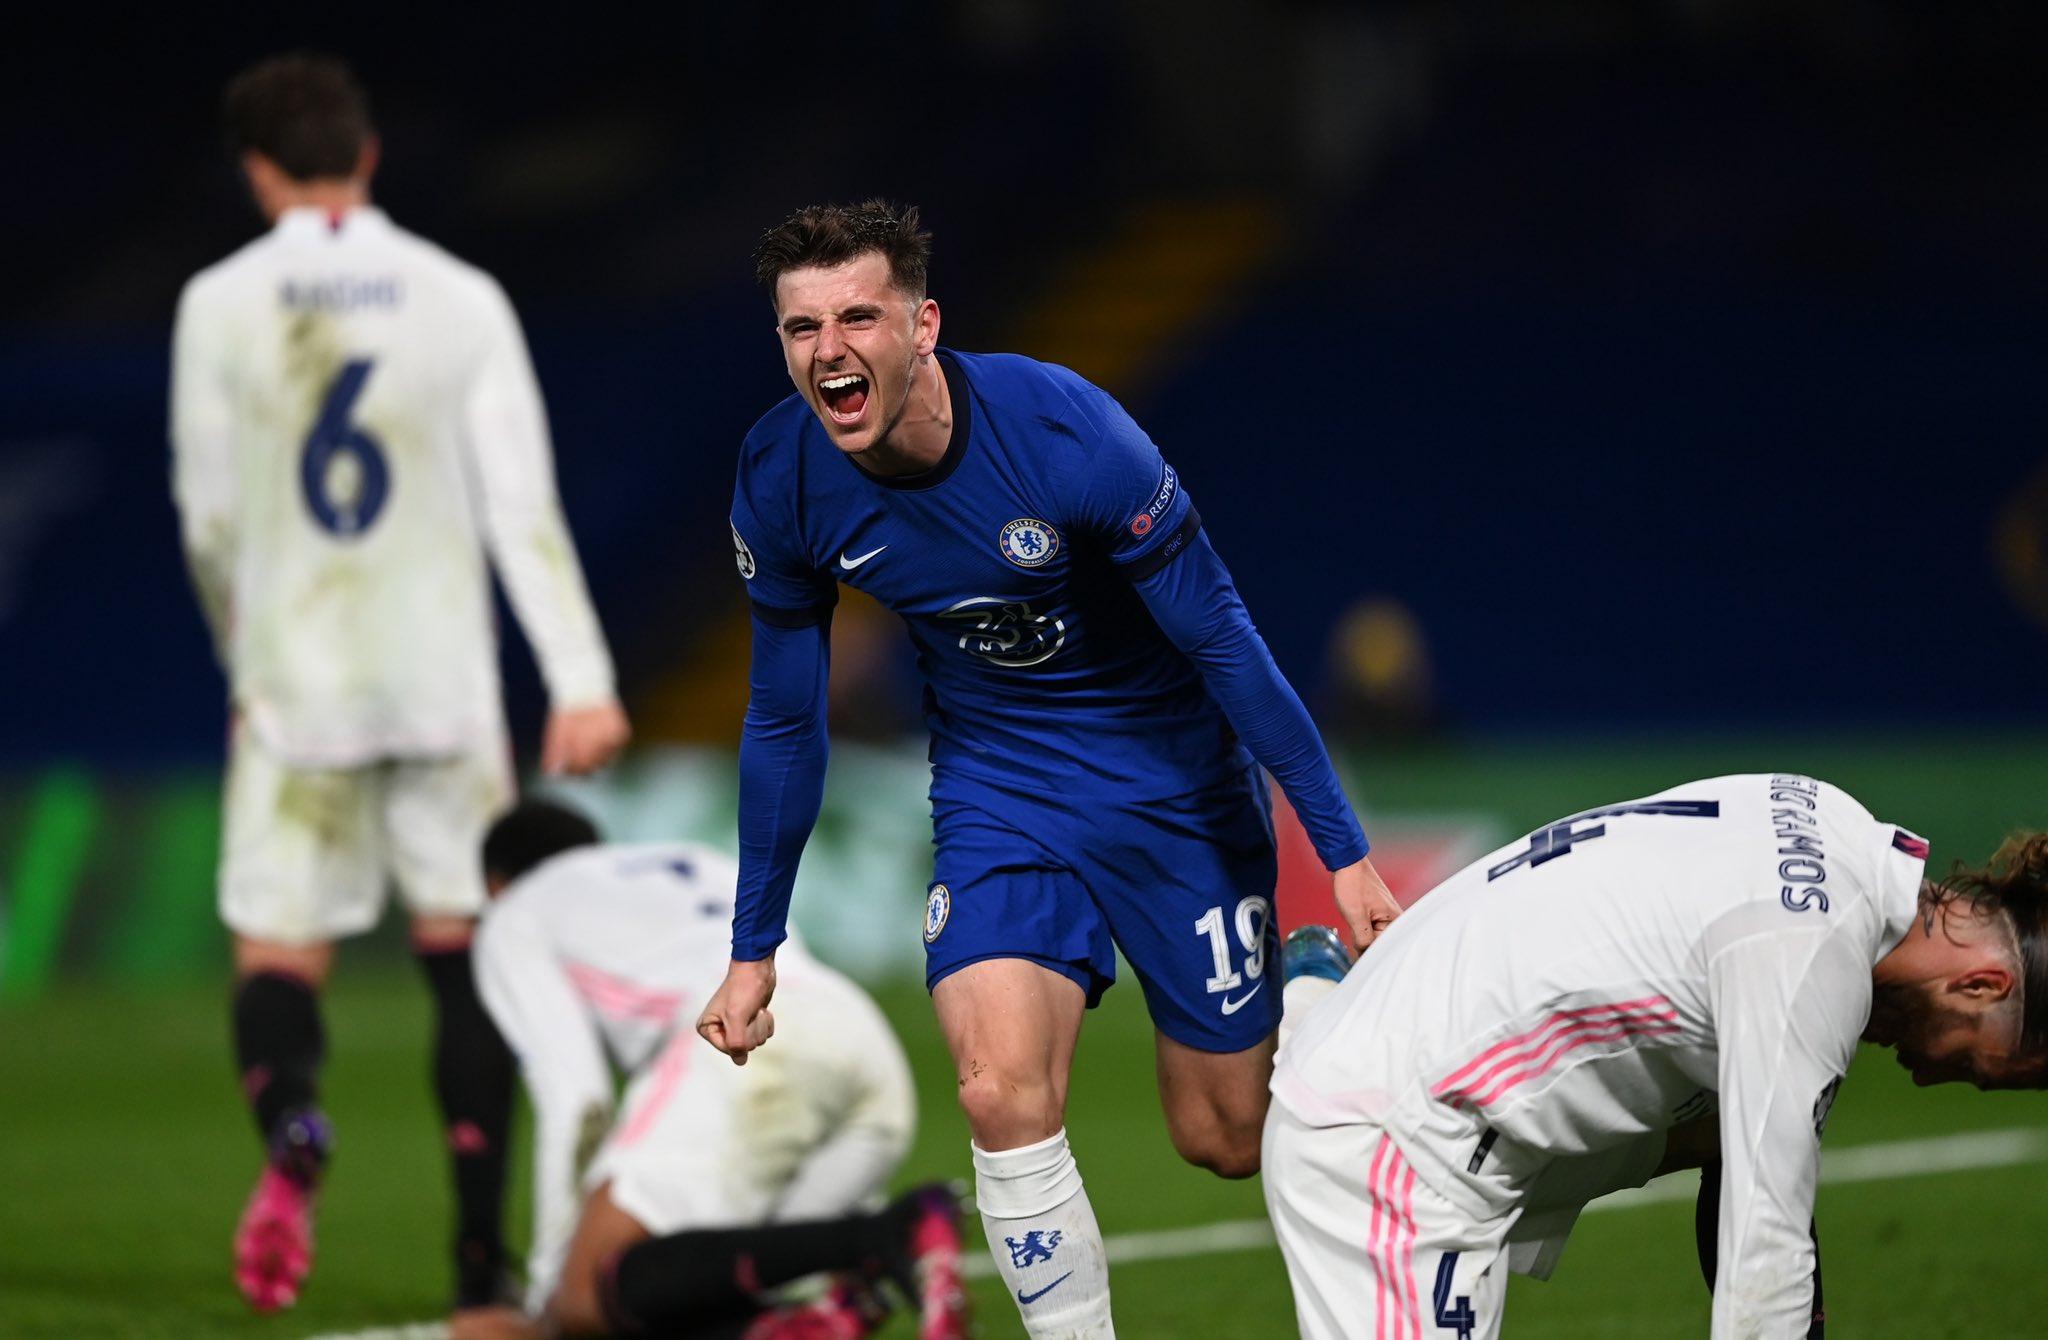 Chelsea vs Manchester City, la final de la Champions 2021